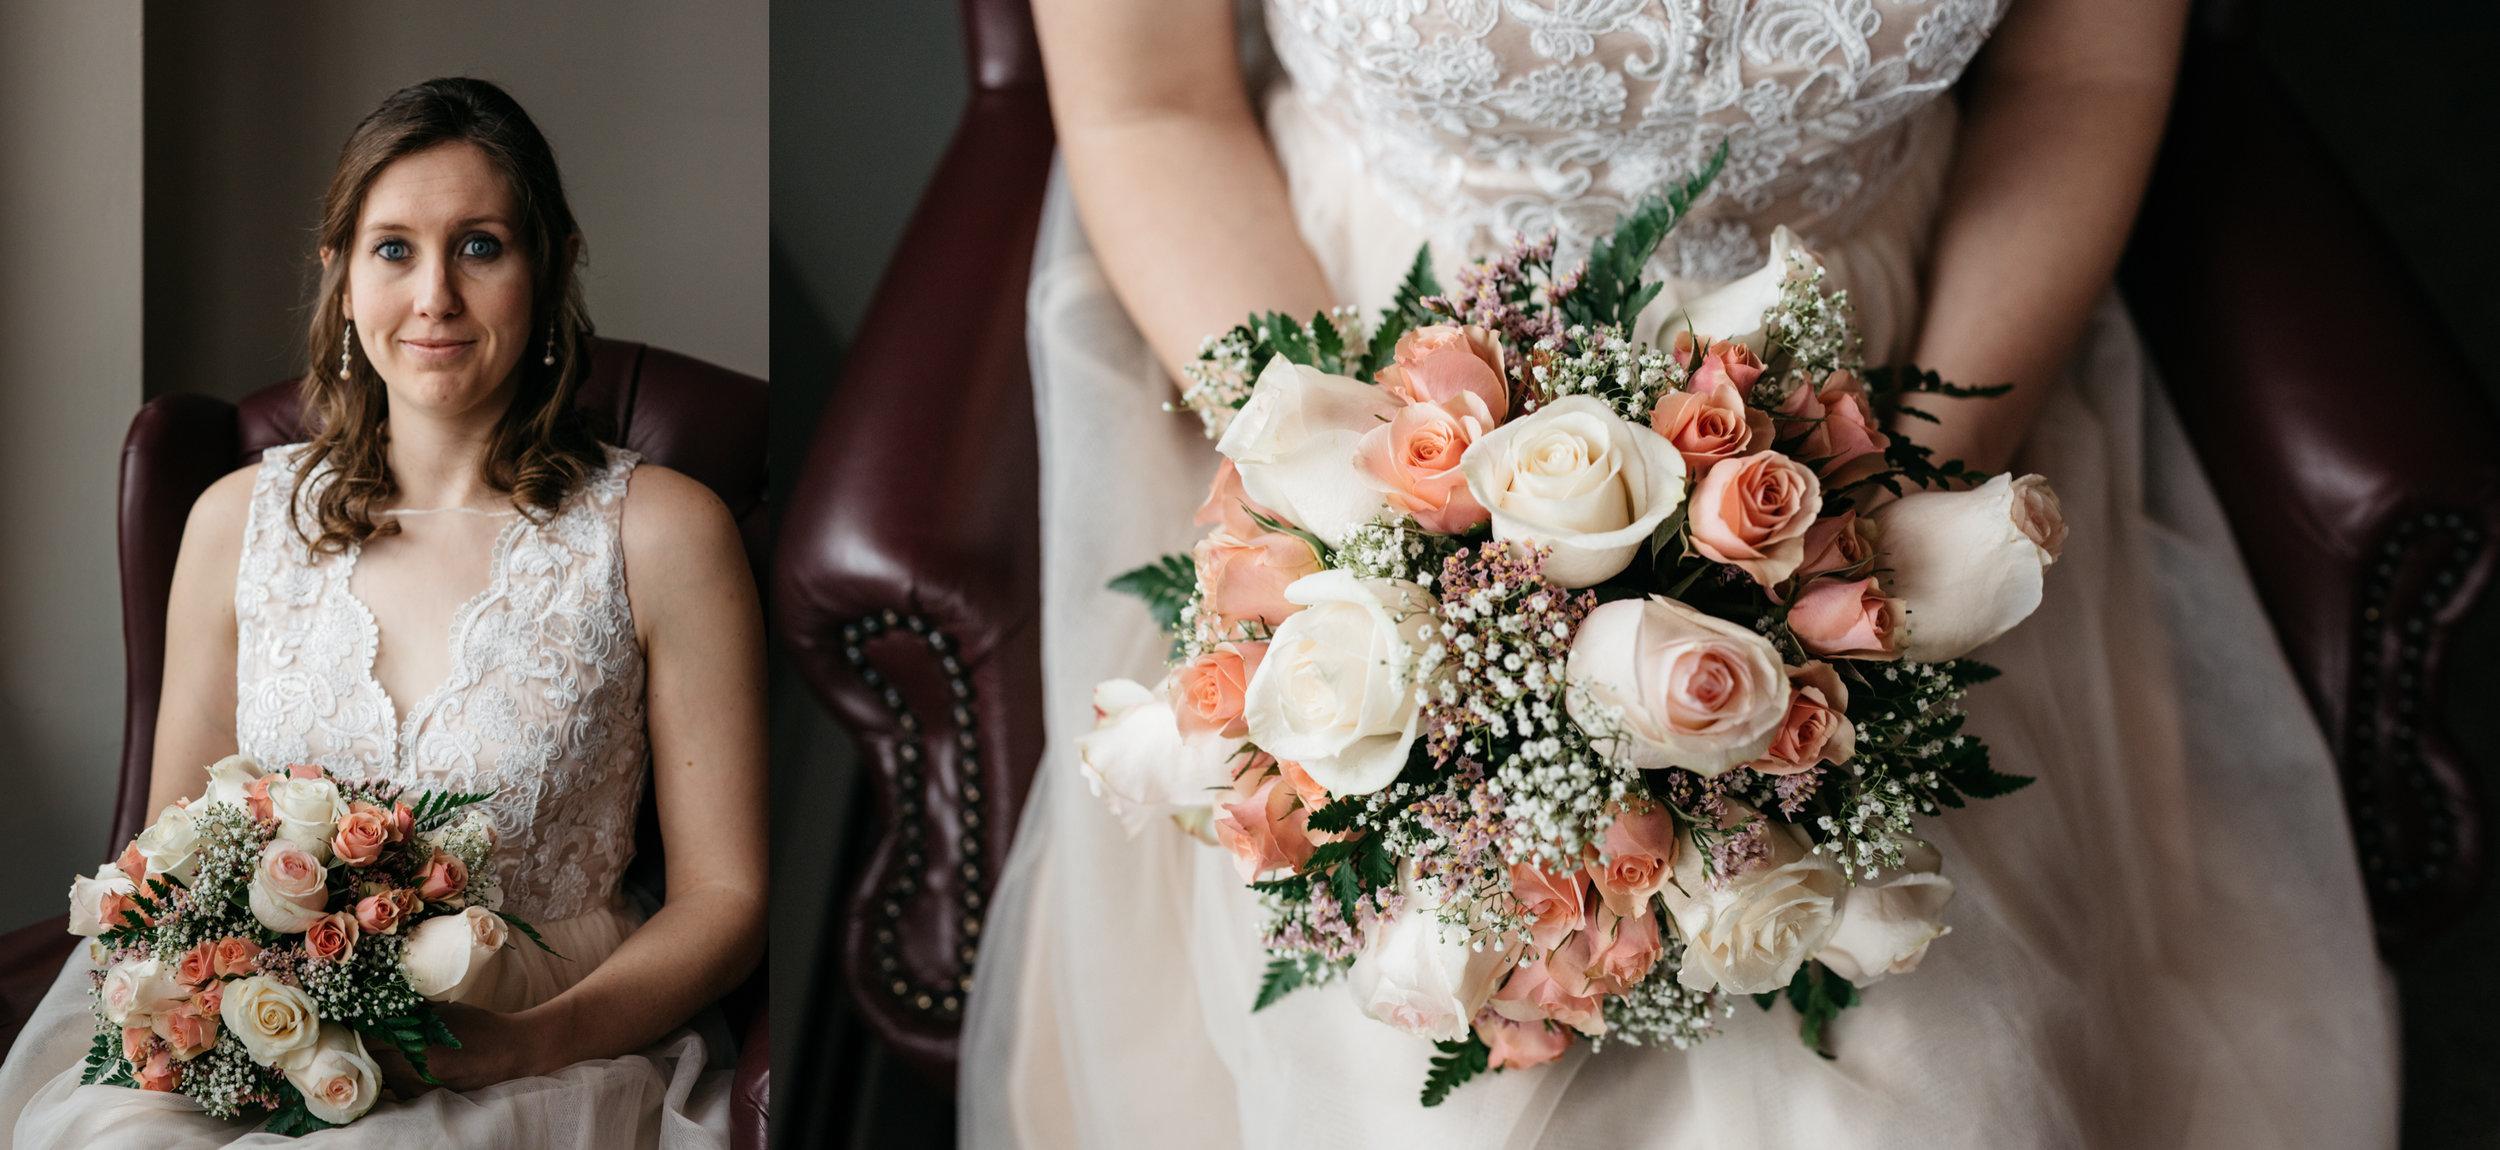 Ligonier wedding portrait, mariah fisher photography.jpg